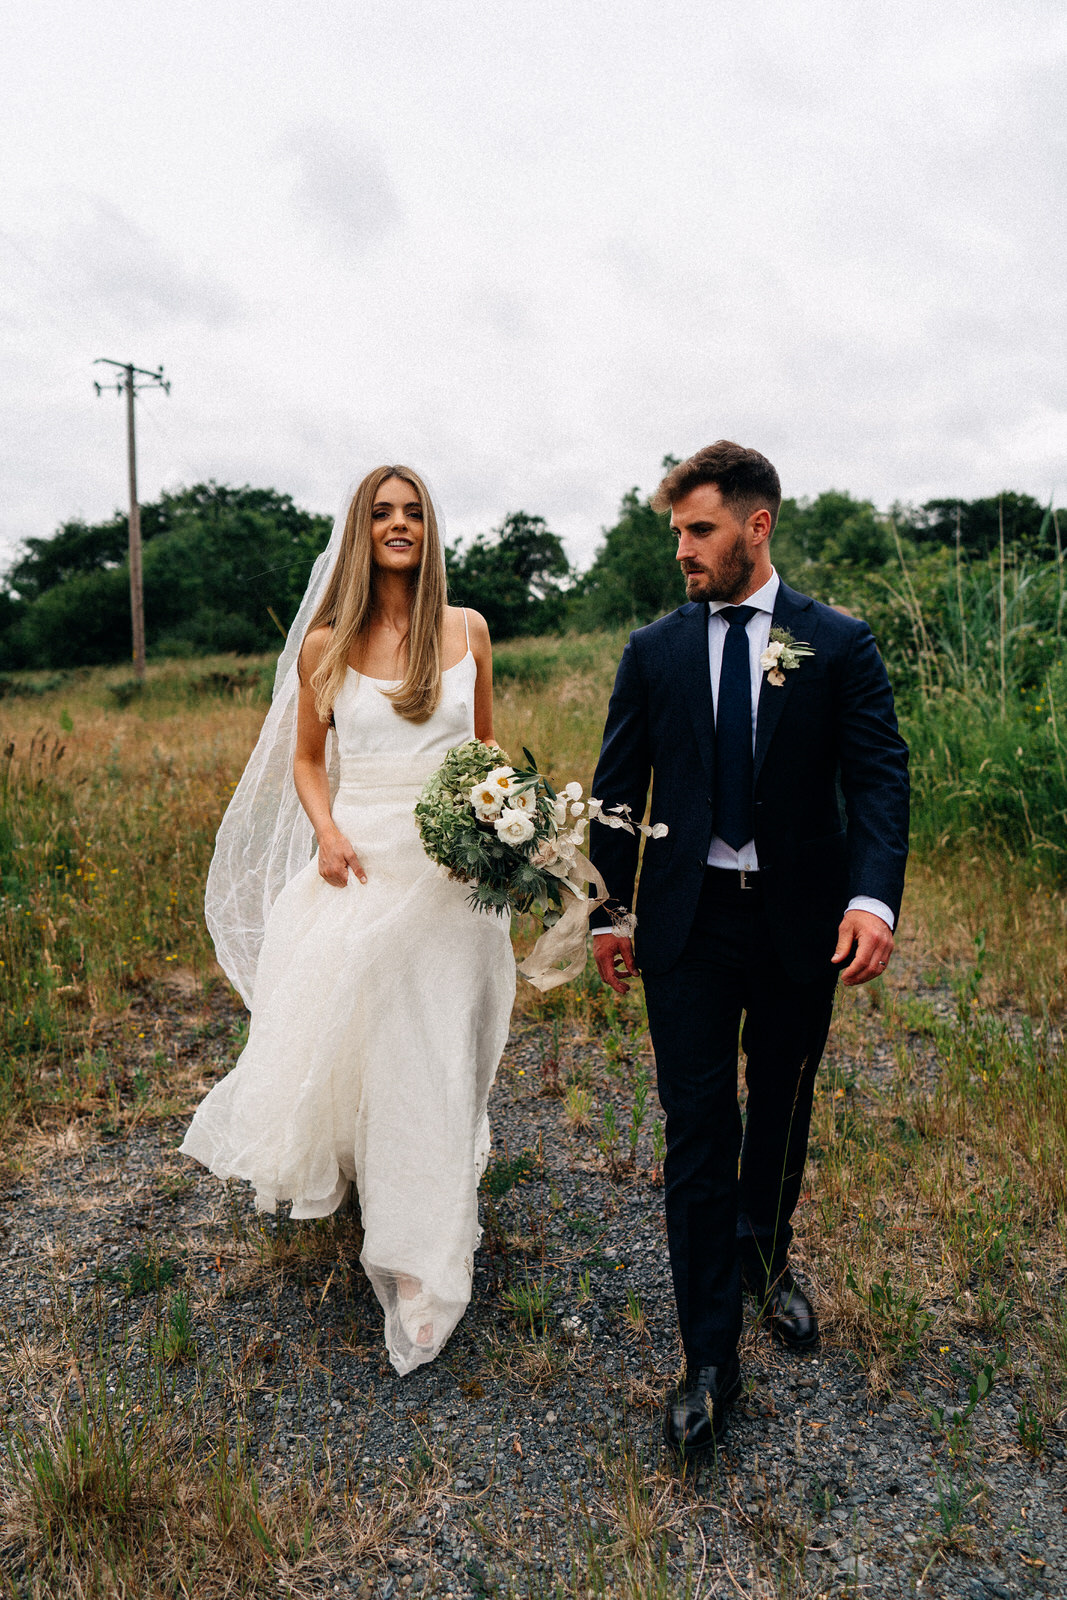 wedding photographer dublin 1,014 109